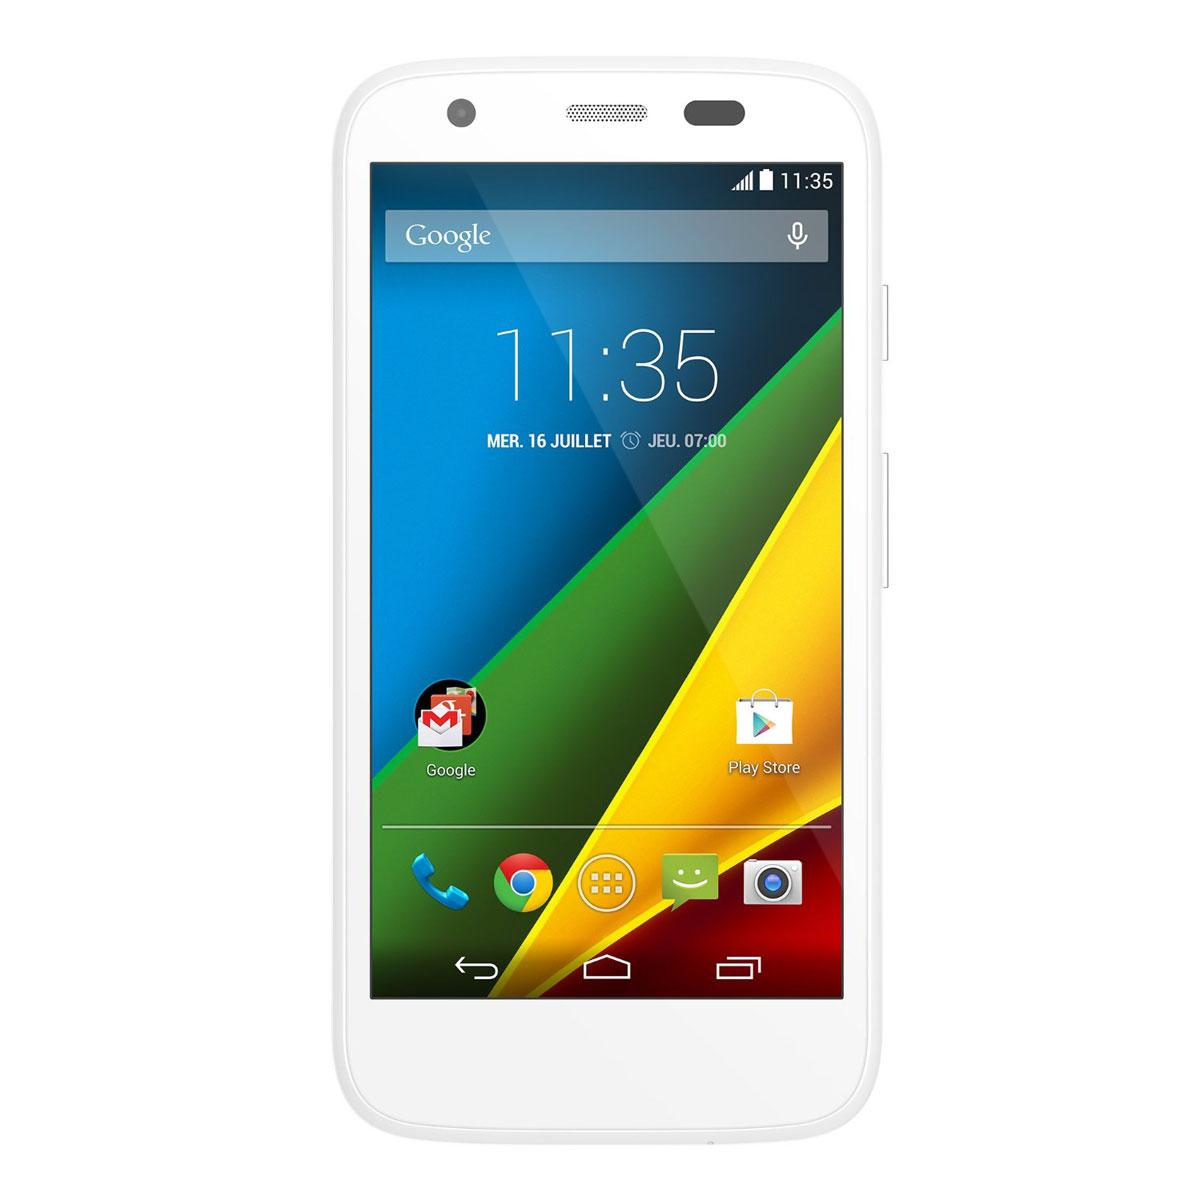 Motorola moto g 4g 8 go blanc mobile smartphone for Photo ecran motorola